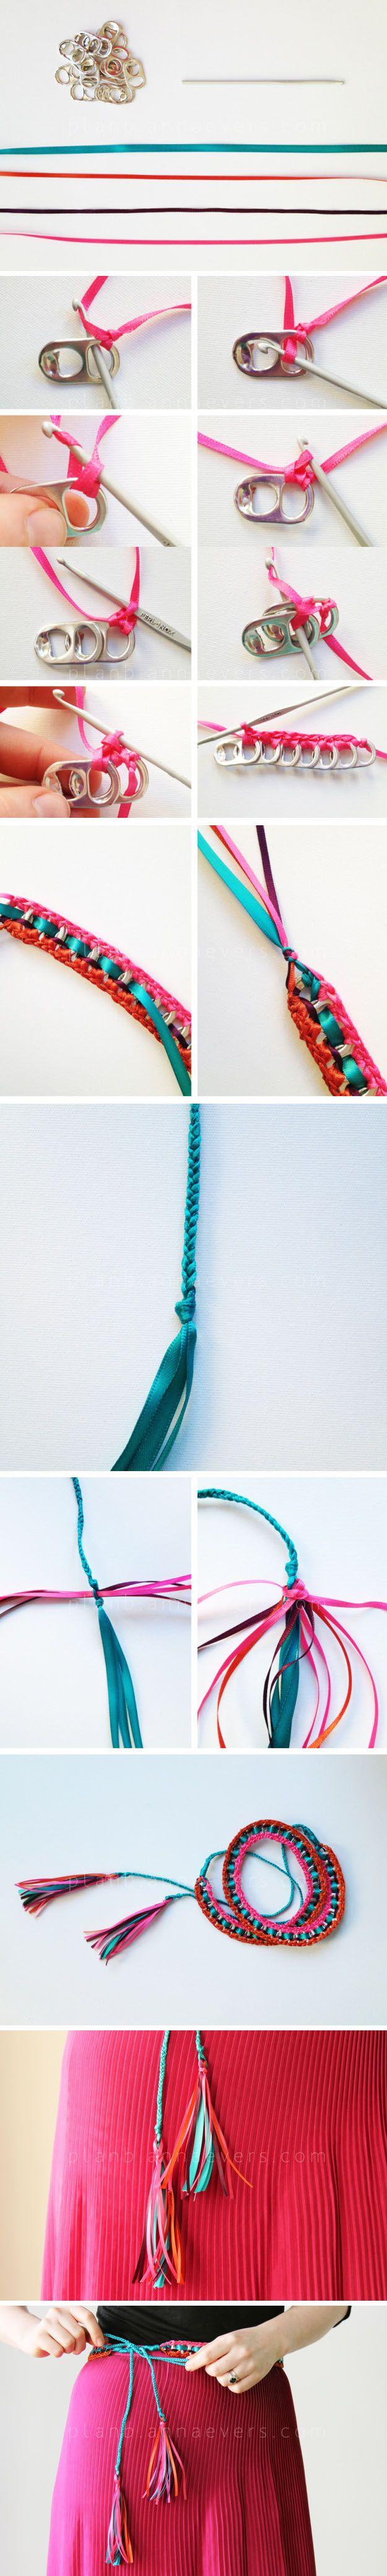 cinturon-anillas-latas-reciclaje-muy-ingenioso